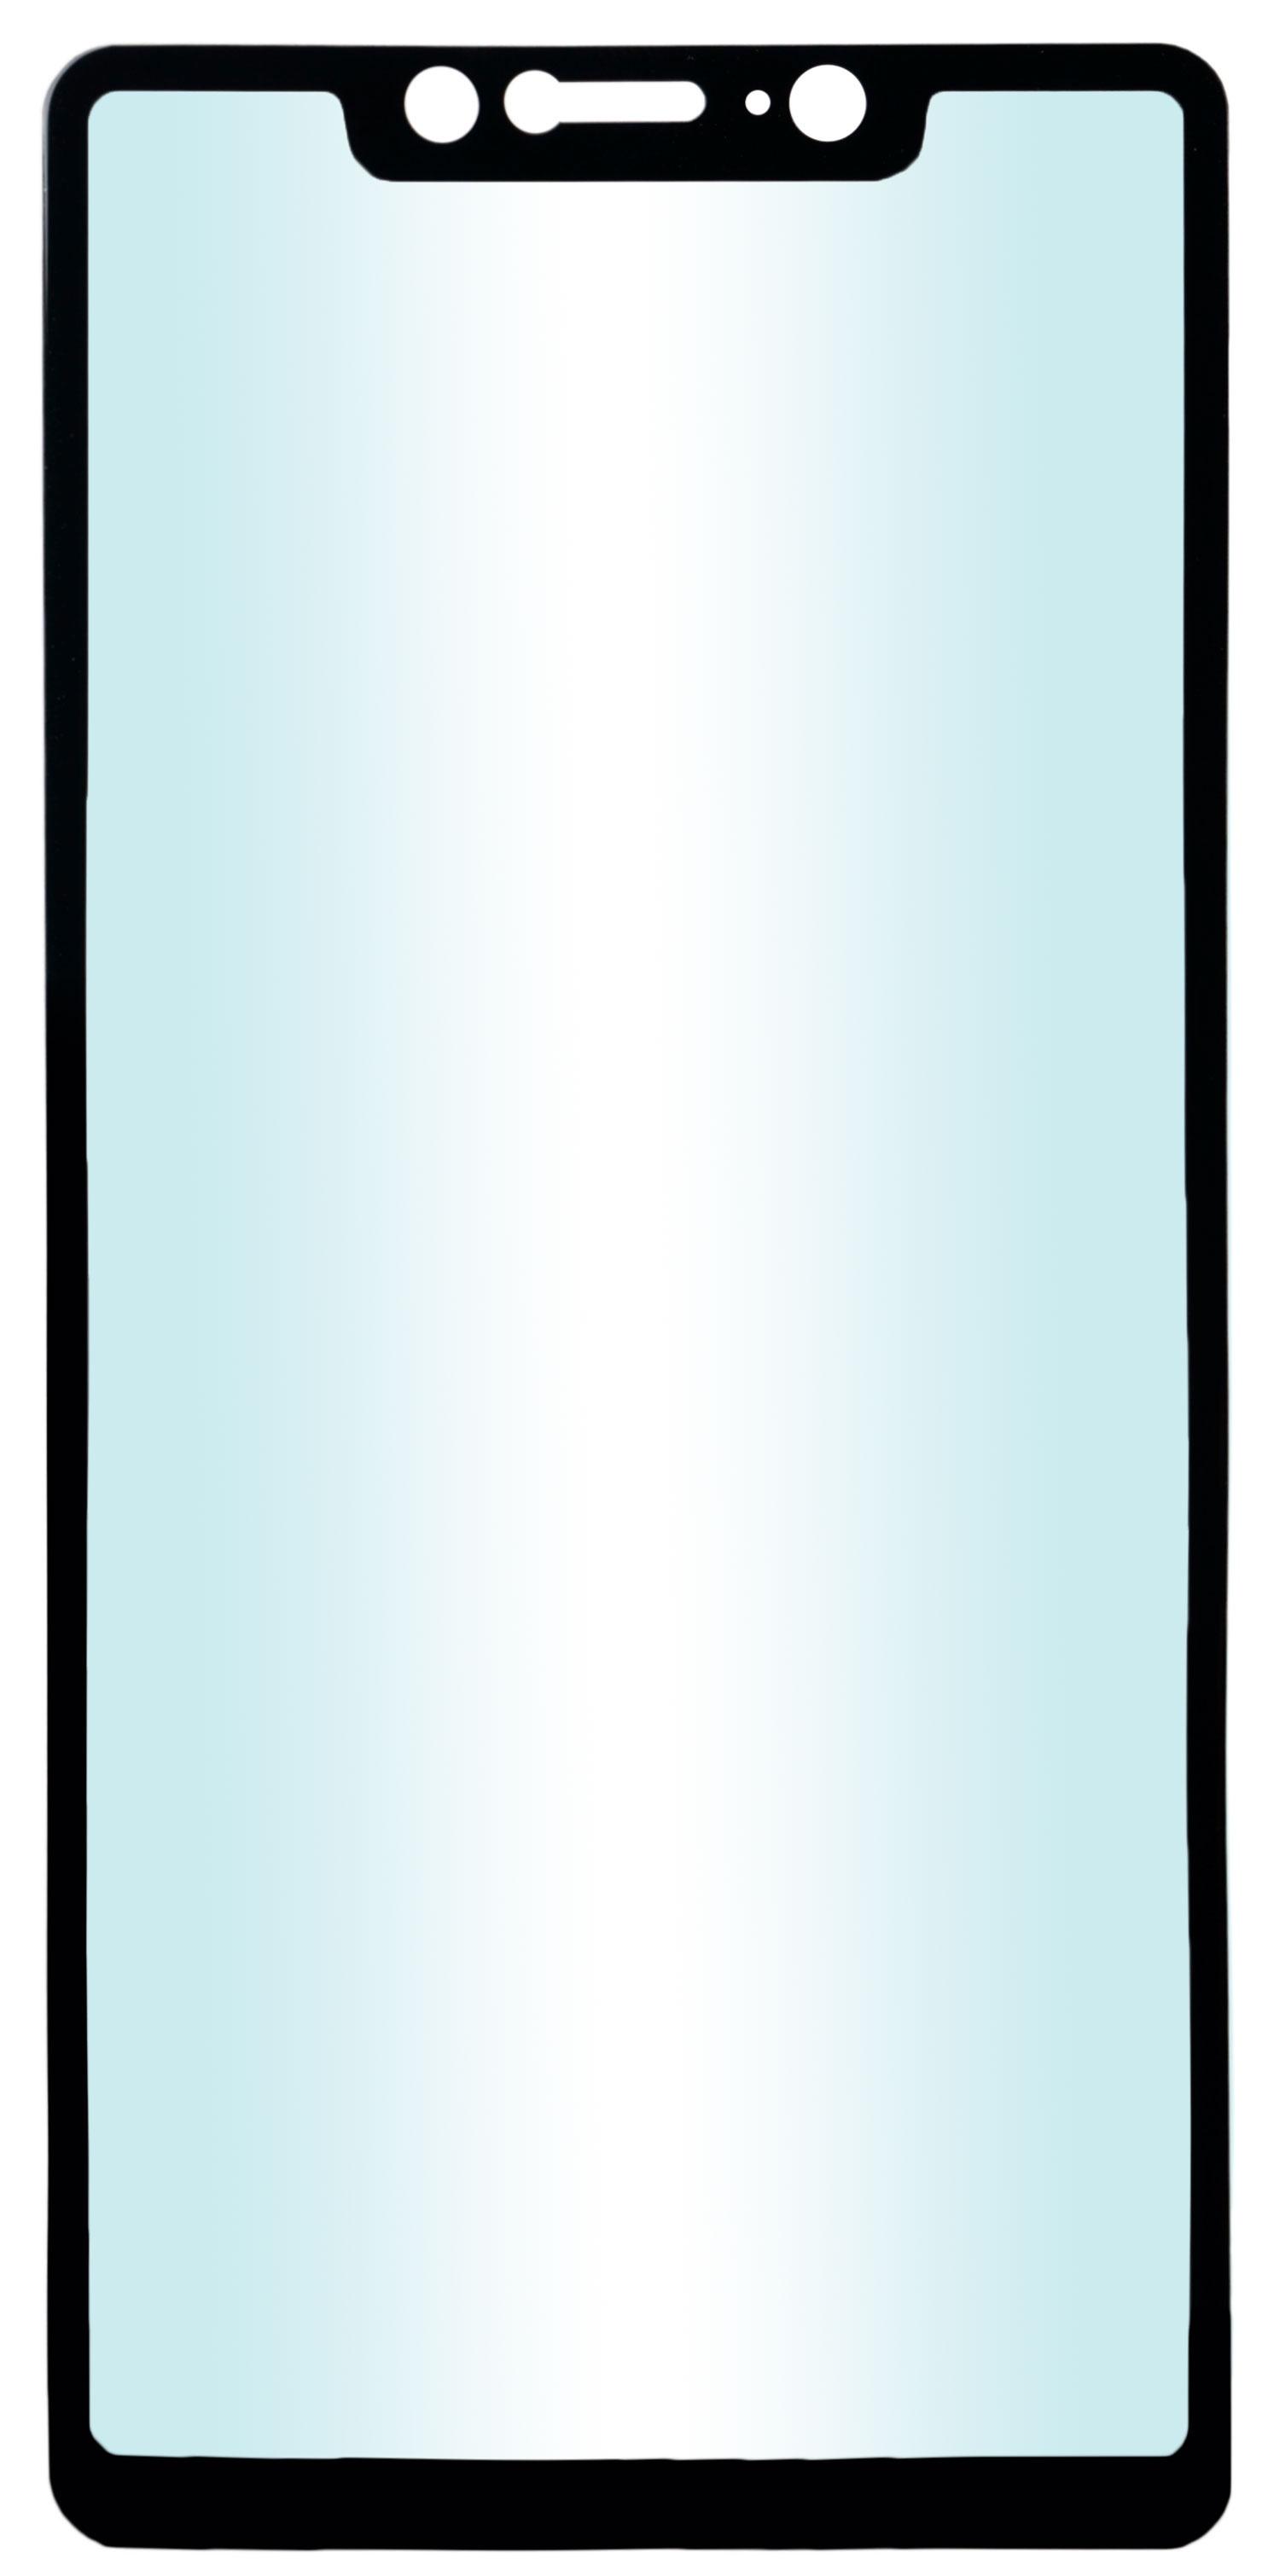 Защитное стекло skinBOX 1 side full screen, 4660041405484, черный защитное стекло skinbox full screen 4630042522817 черный